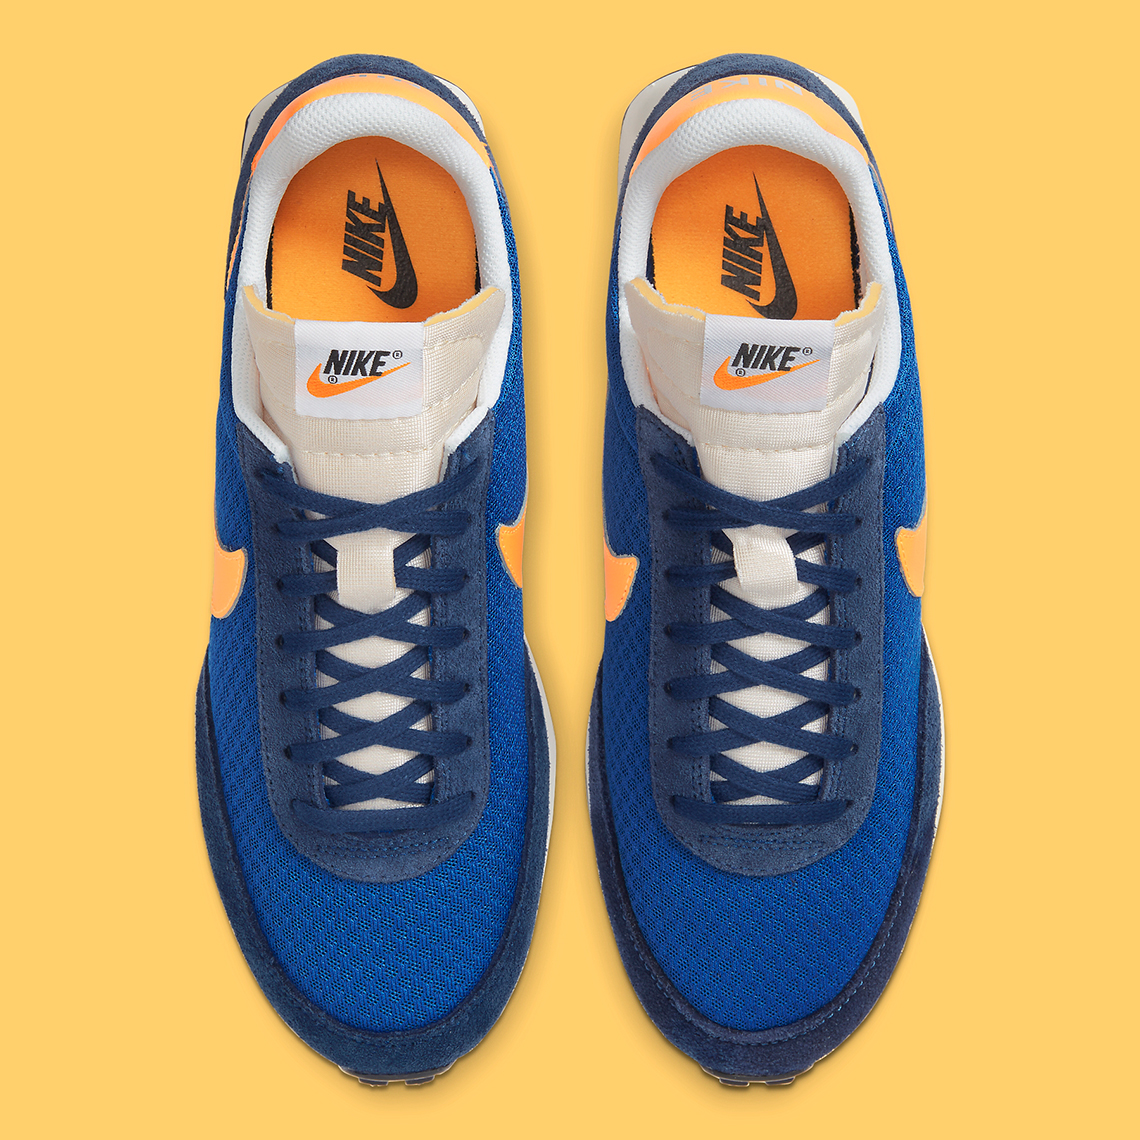 Nike Tailwind 79 Bleu Jaune CW4808 484 Infos Release Crumpe